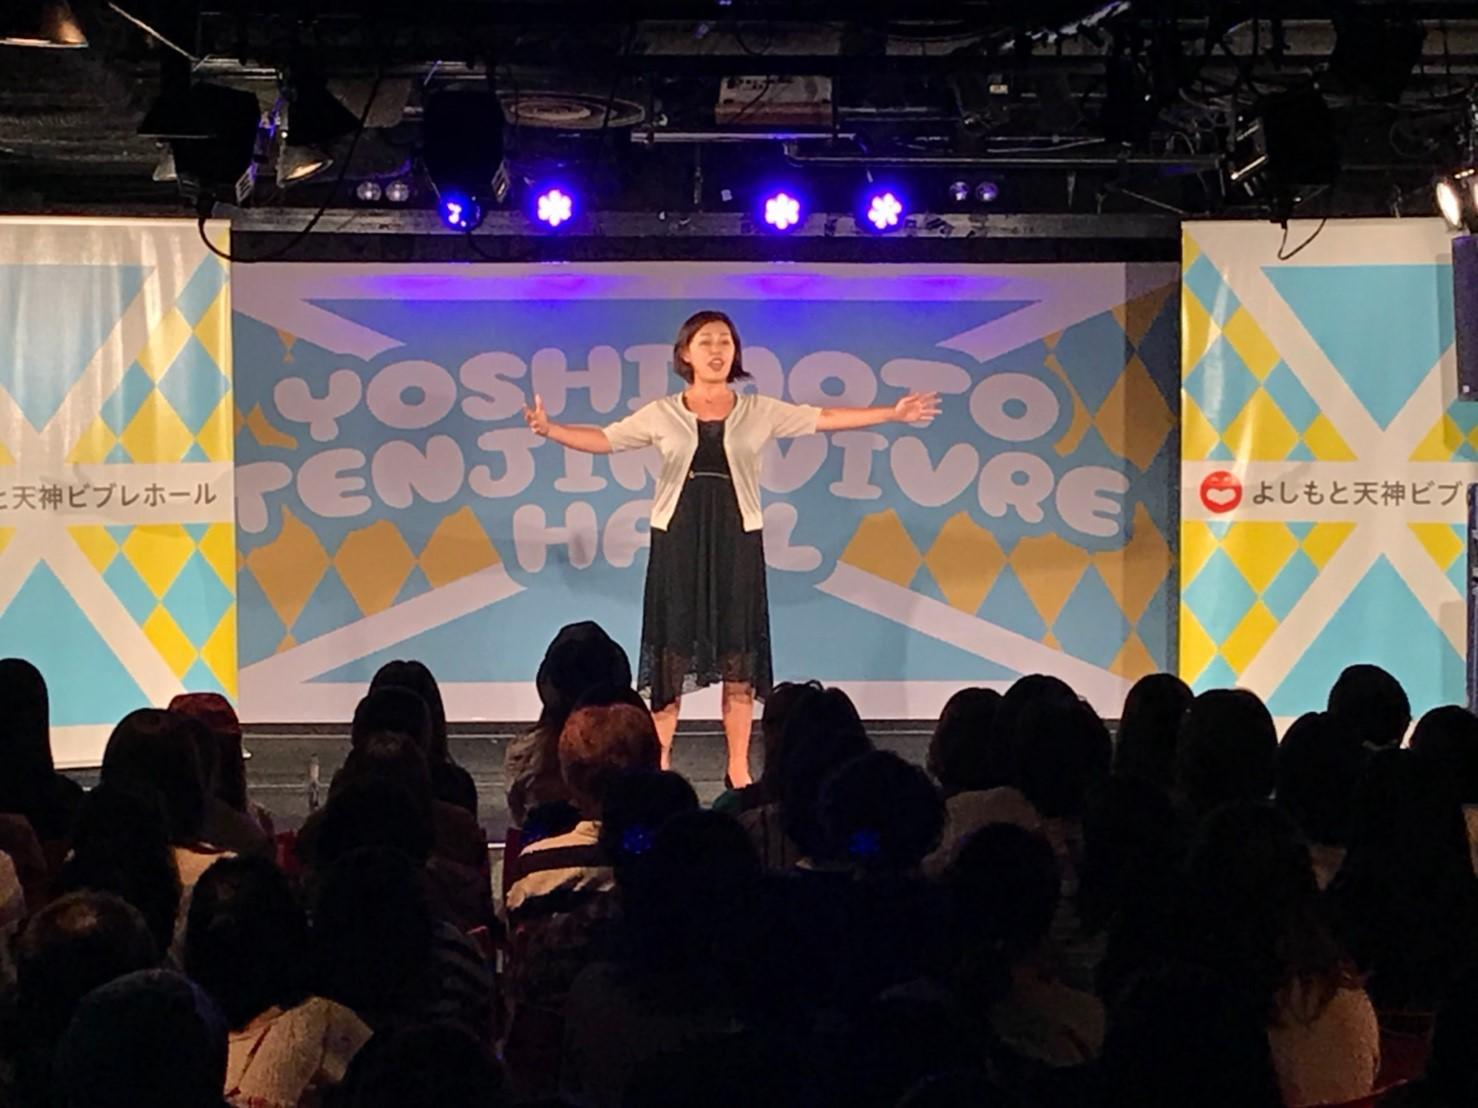 http://news.yoshimoto.co.jp/20181006174835-bbd738fa728c295b8f331619725df082a5c2d4cc.jpg